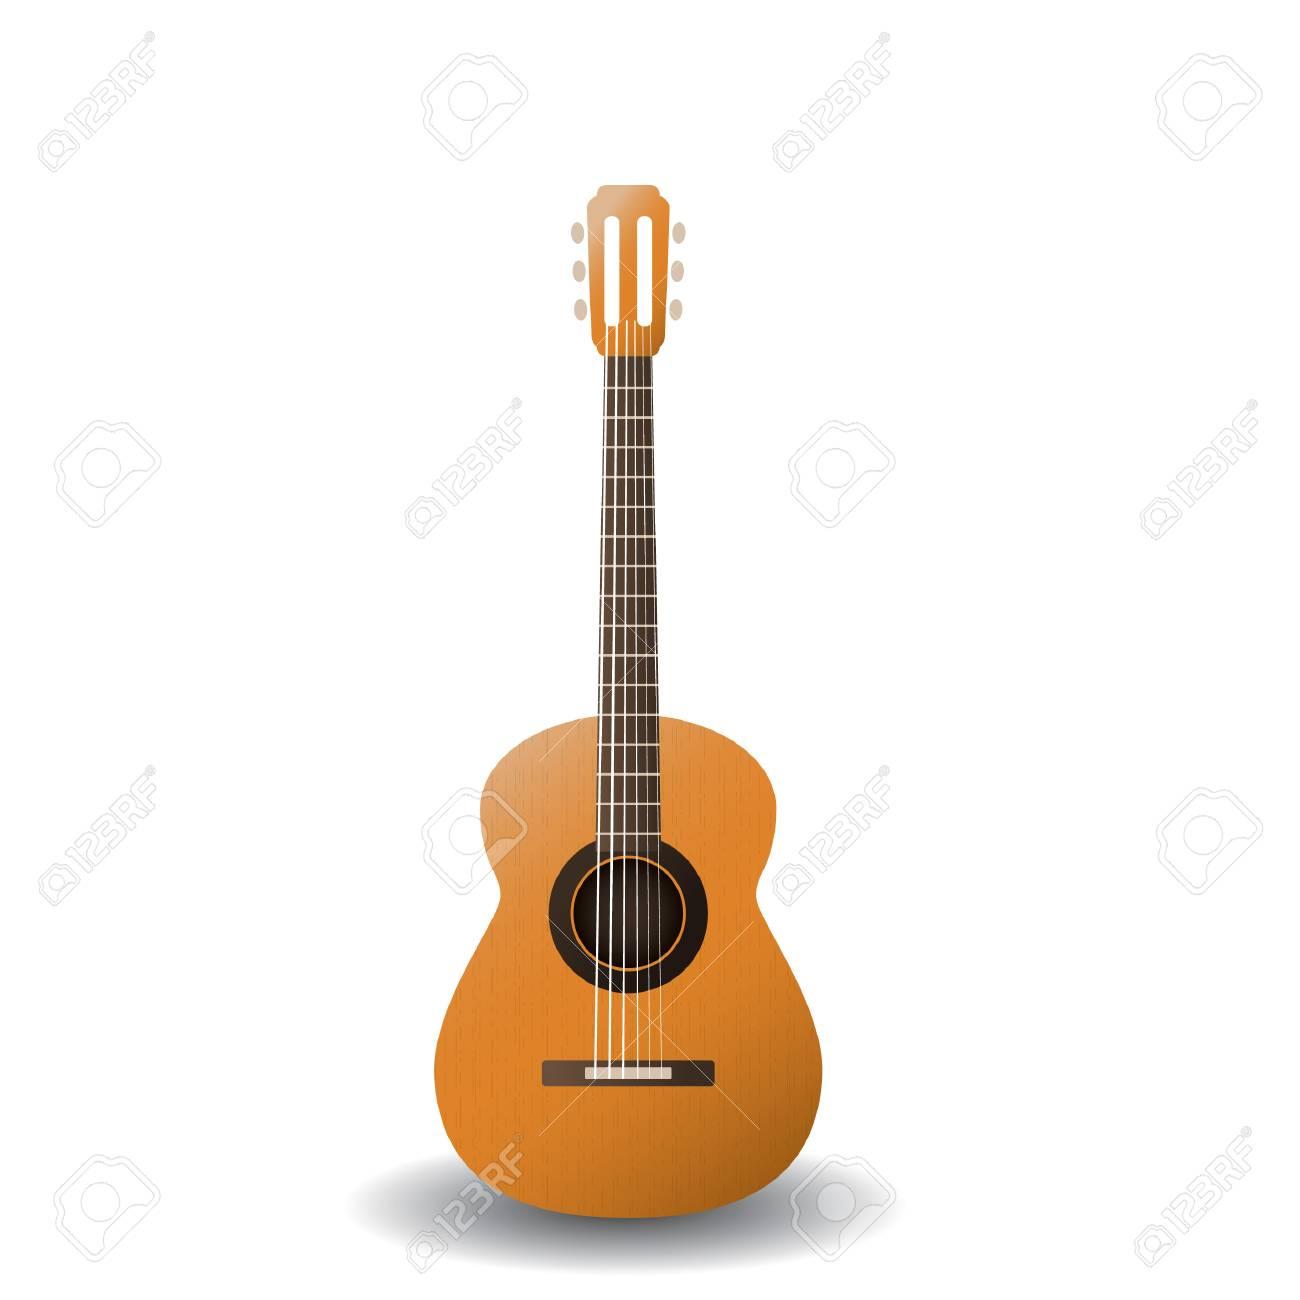 acoustic guitar - 106668264